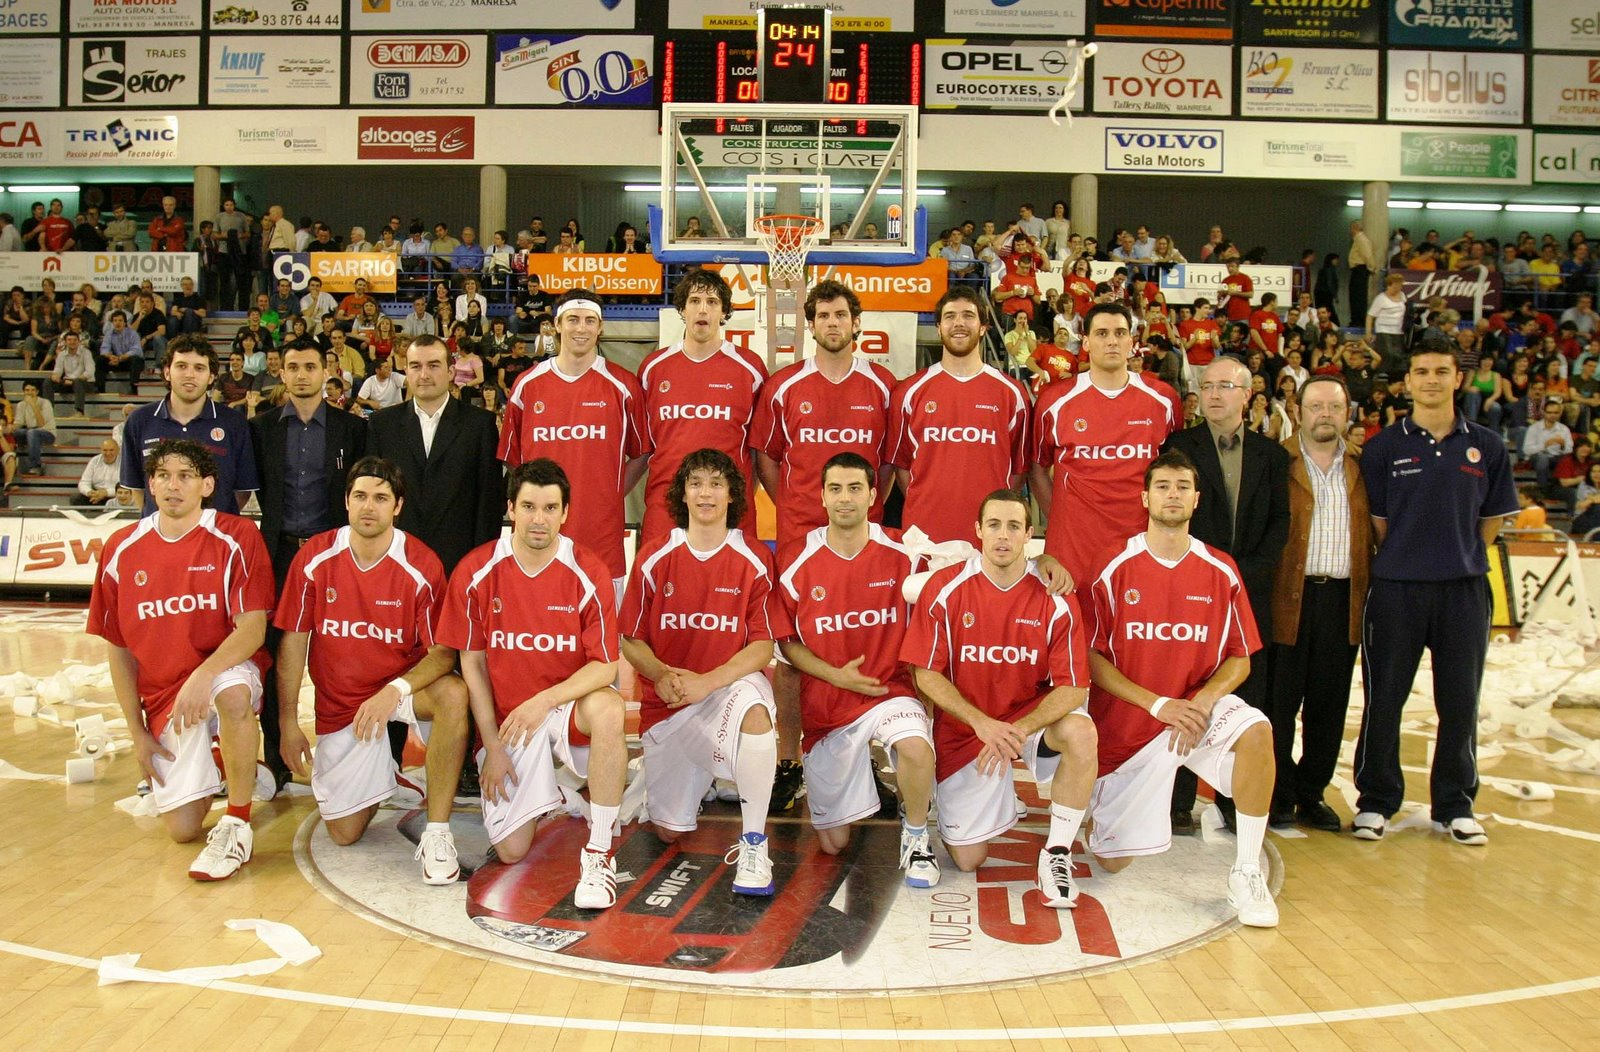 [Plantilla RICOH Manresa play off LEB 2006-07.jpg]